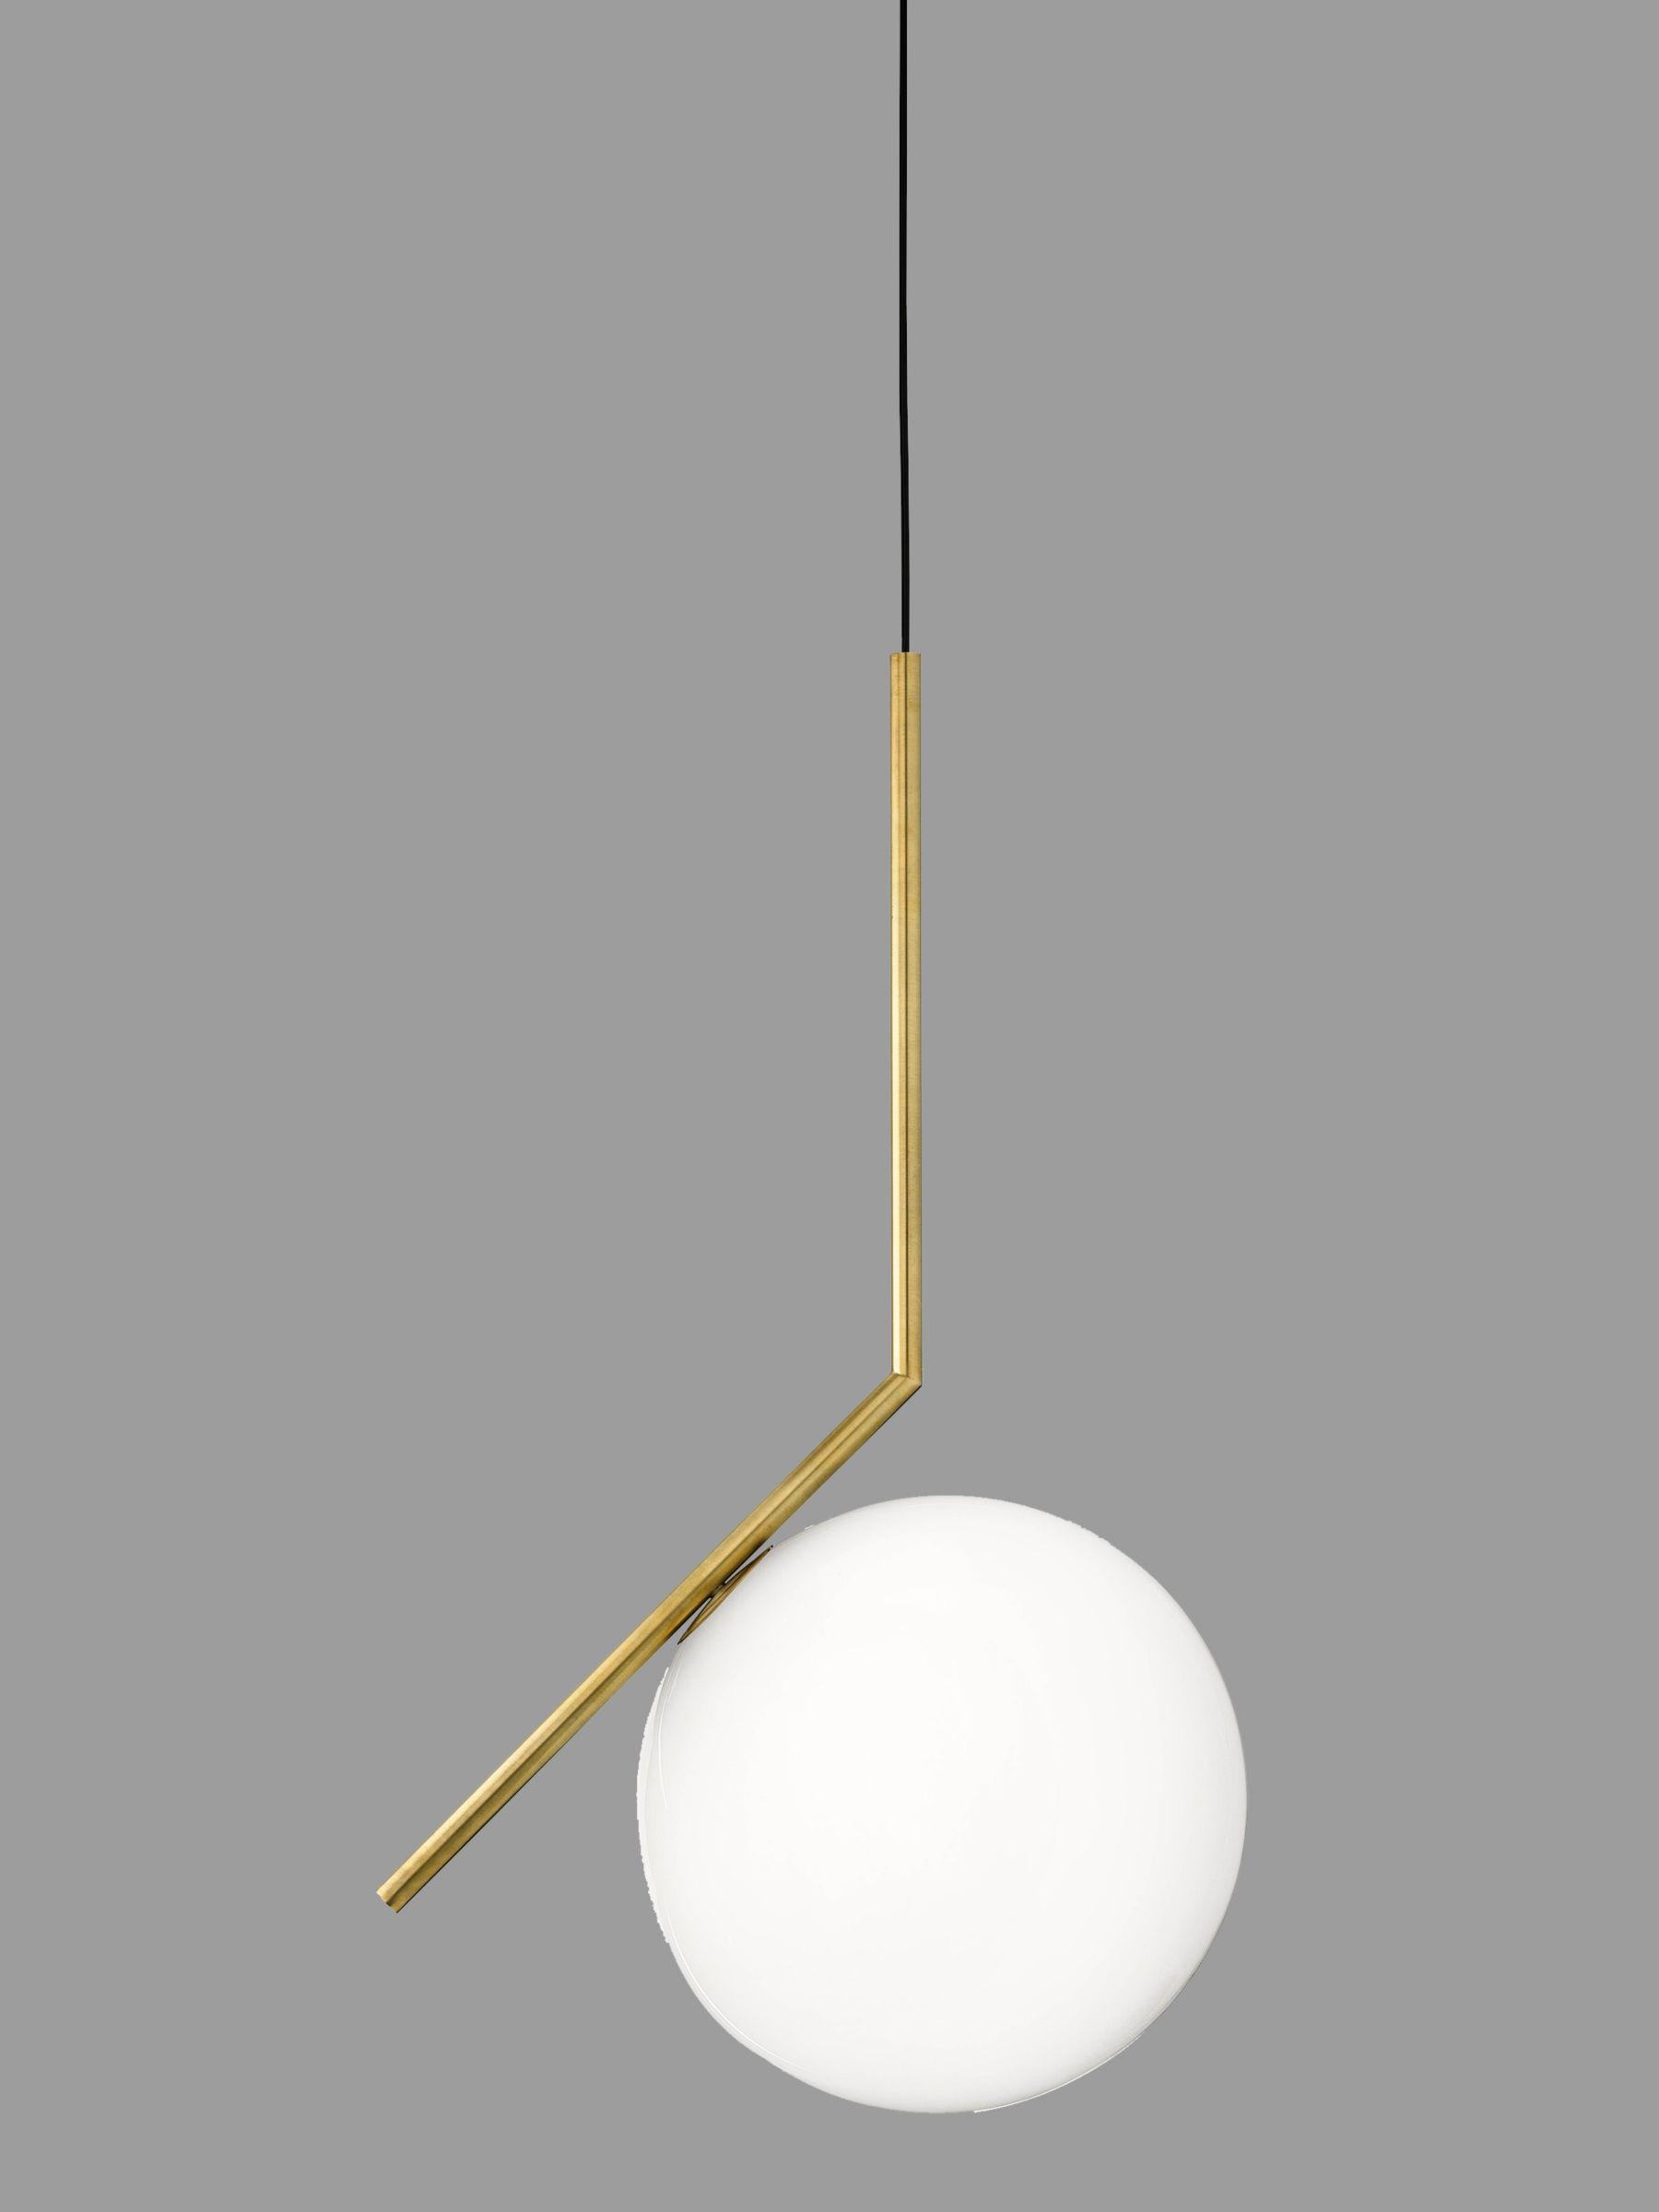 Flos Flos IC S2 Ceiling Light, 30cm, Brushed Brass